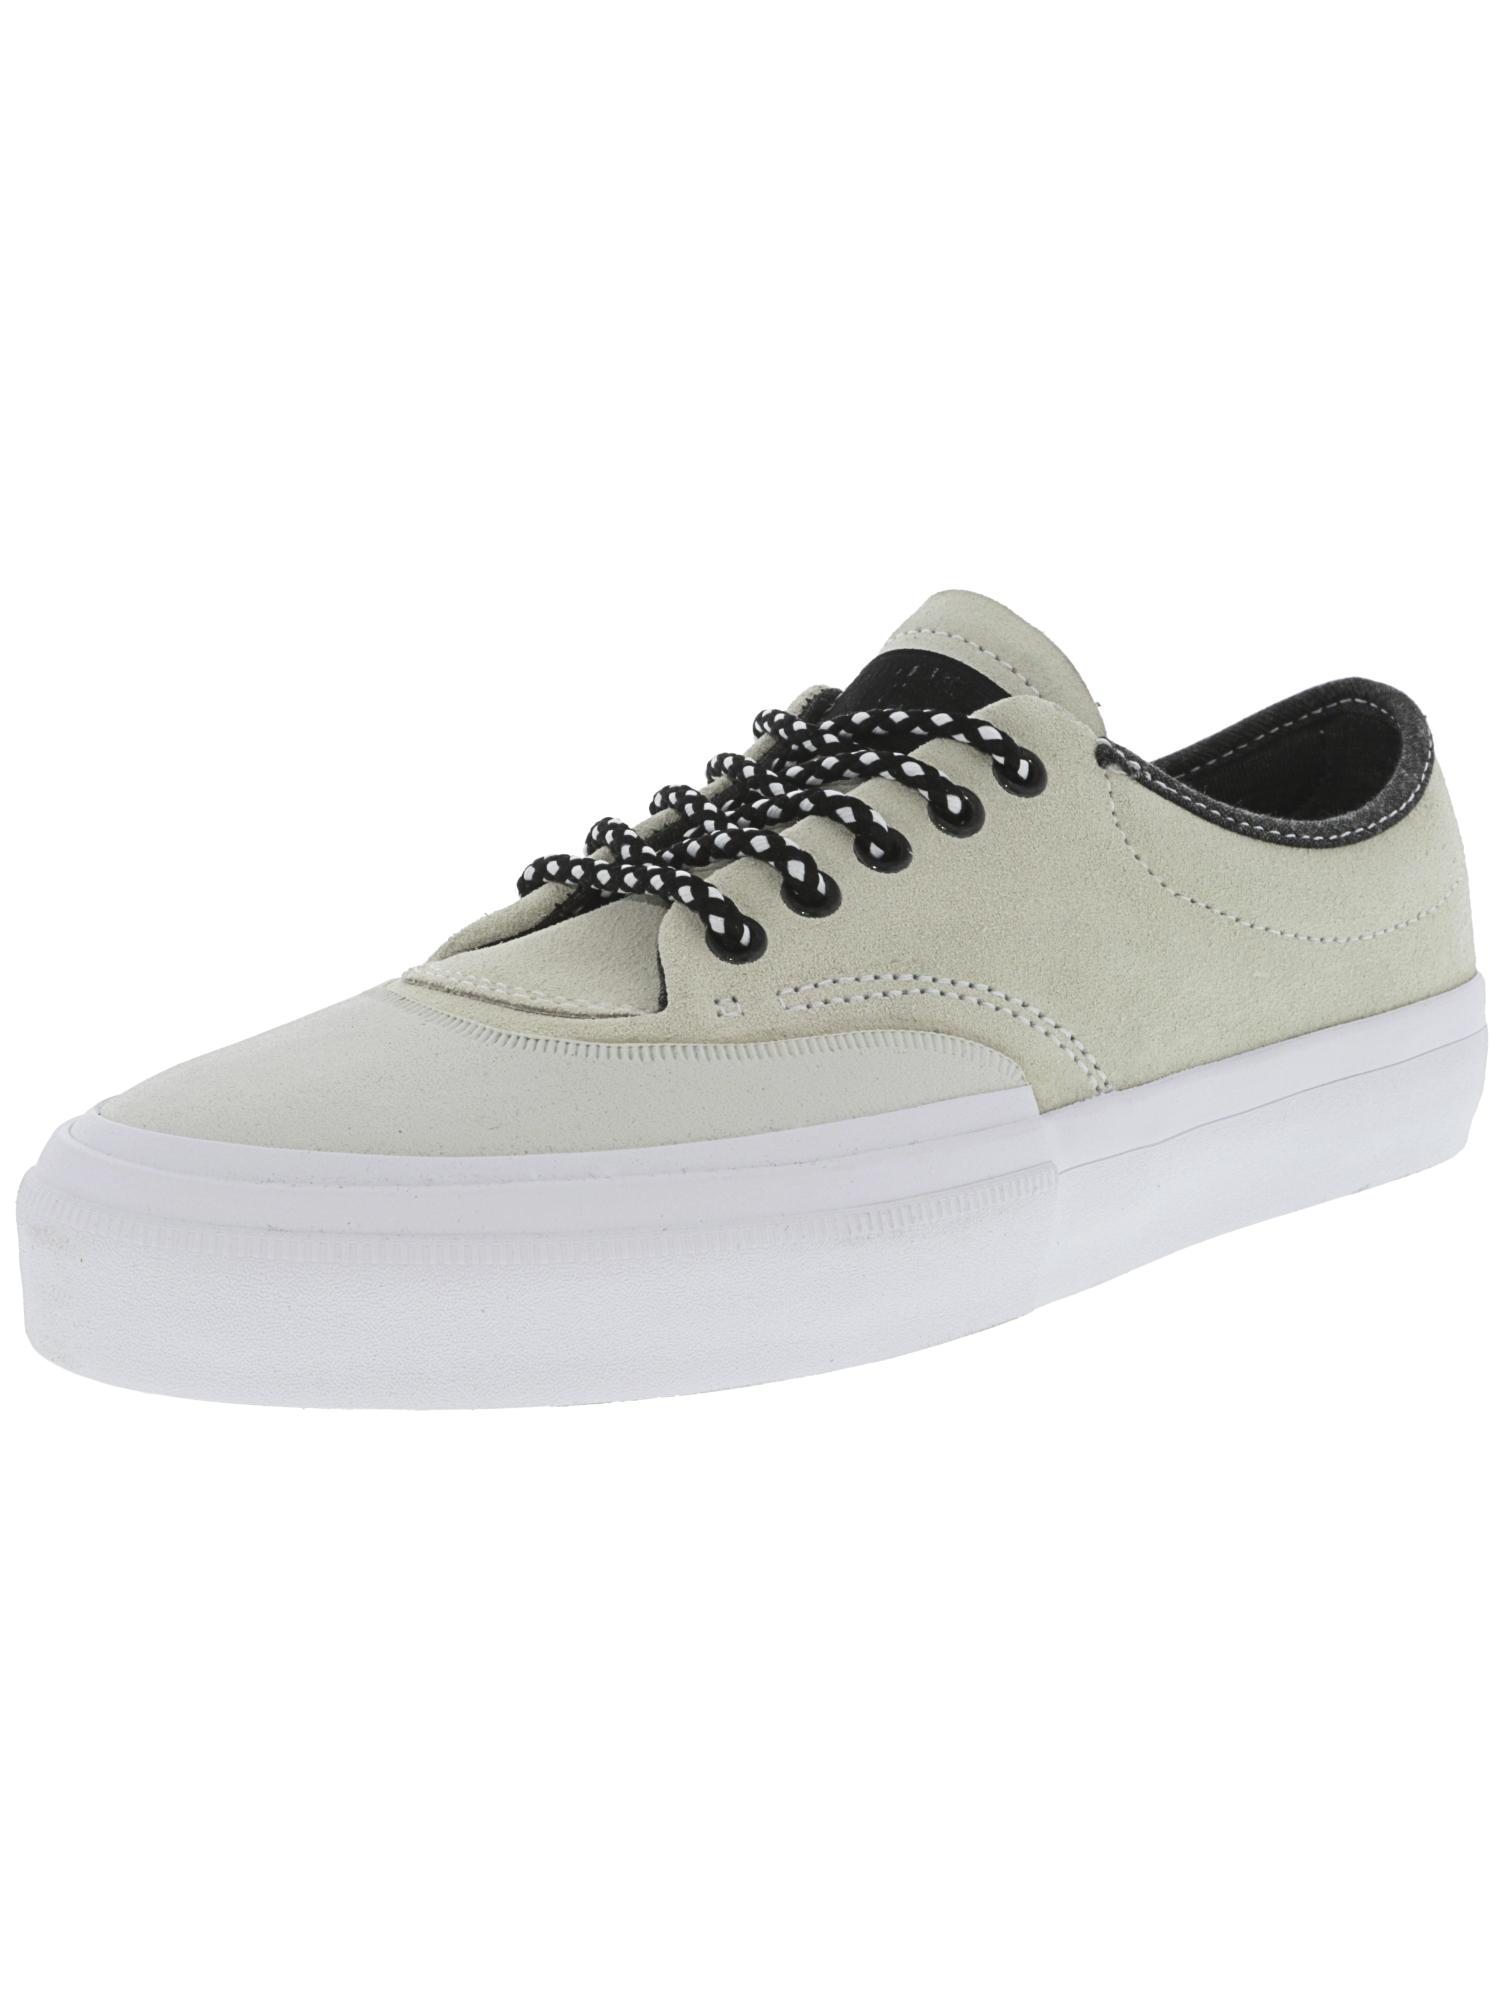 Converse-Crimson-Suede-Ox-Ankle-High-Fashion-Sneaker